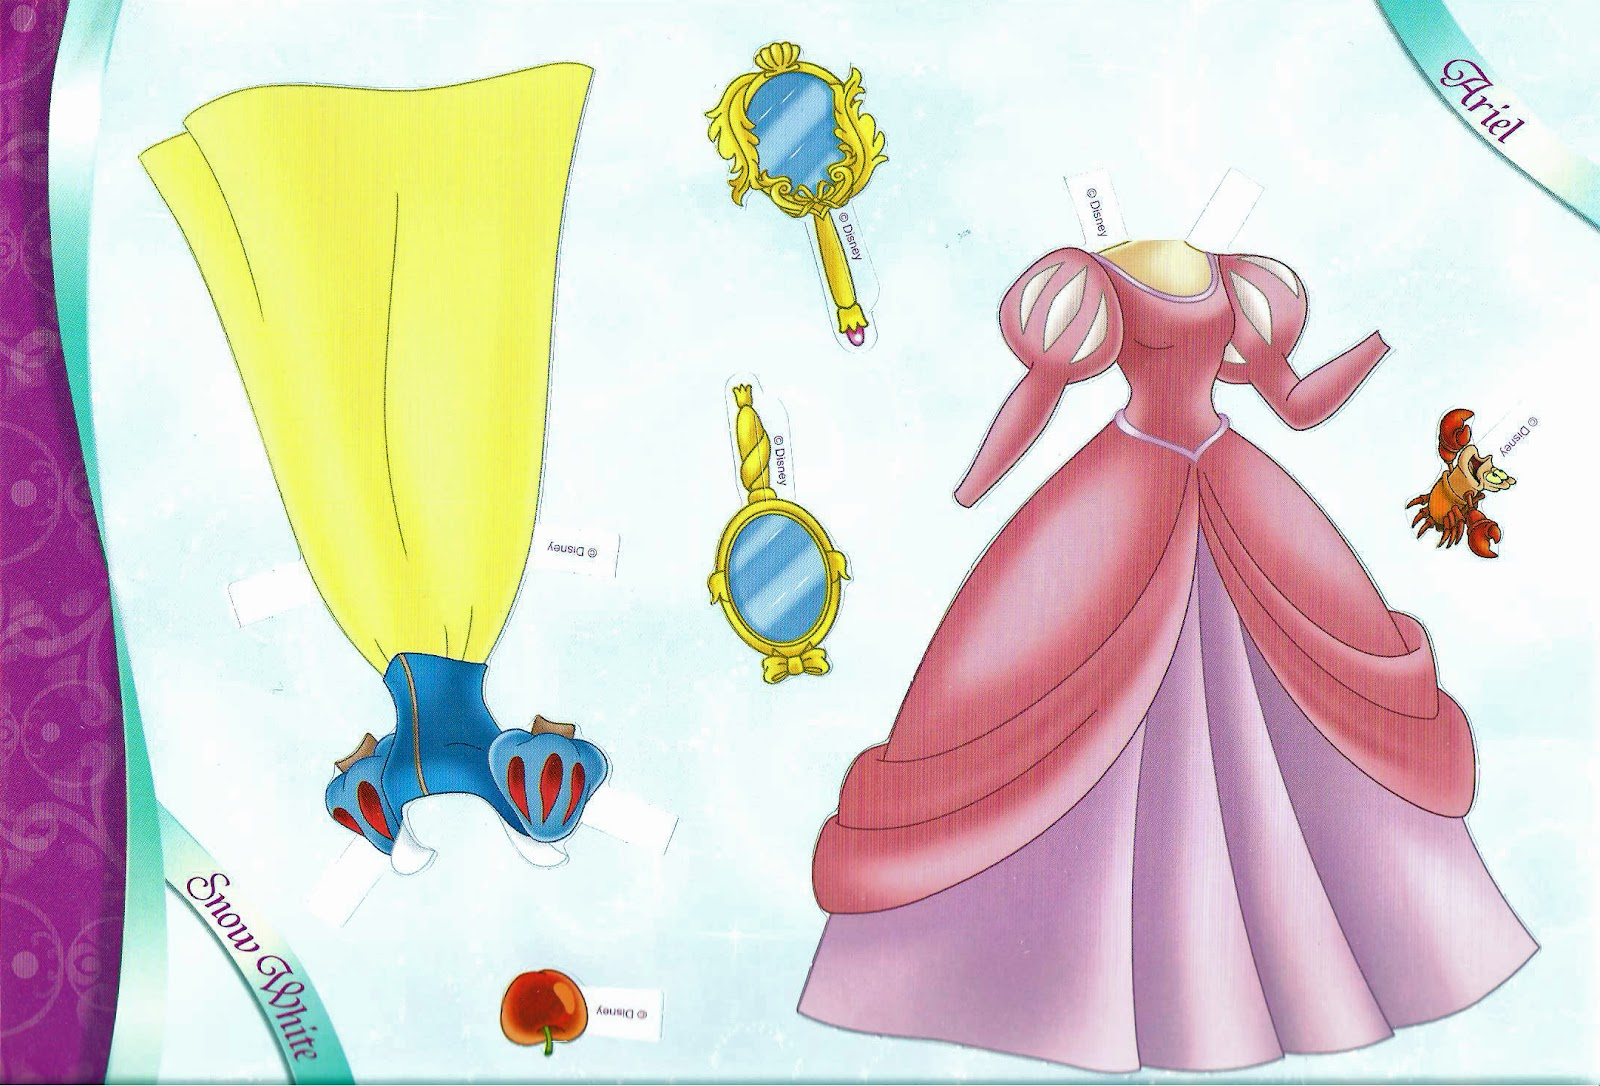 Dress up princess doll - All Dressed Up Disney Princess Paper Dolls Part 1